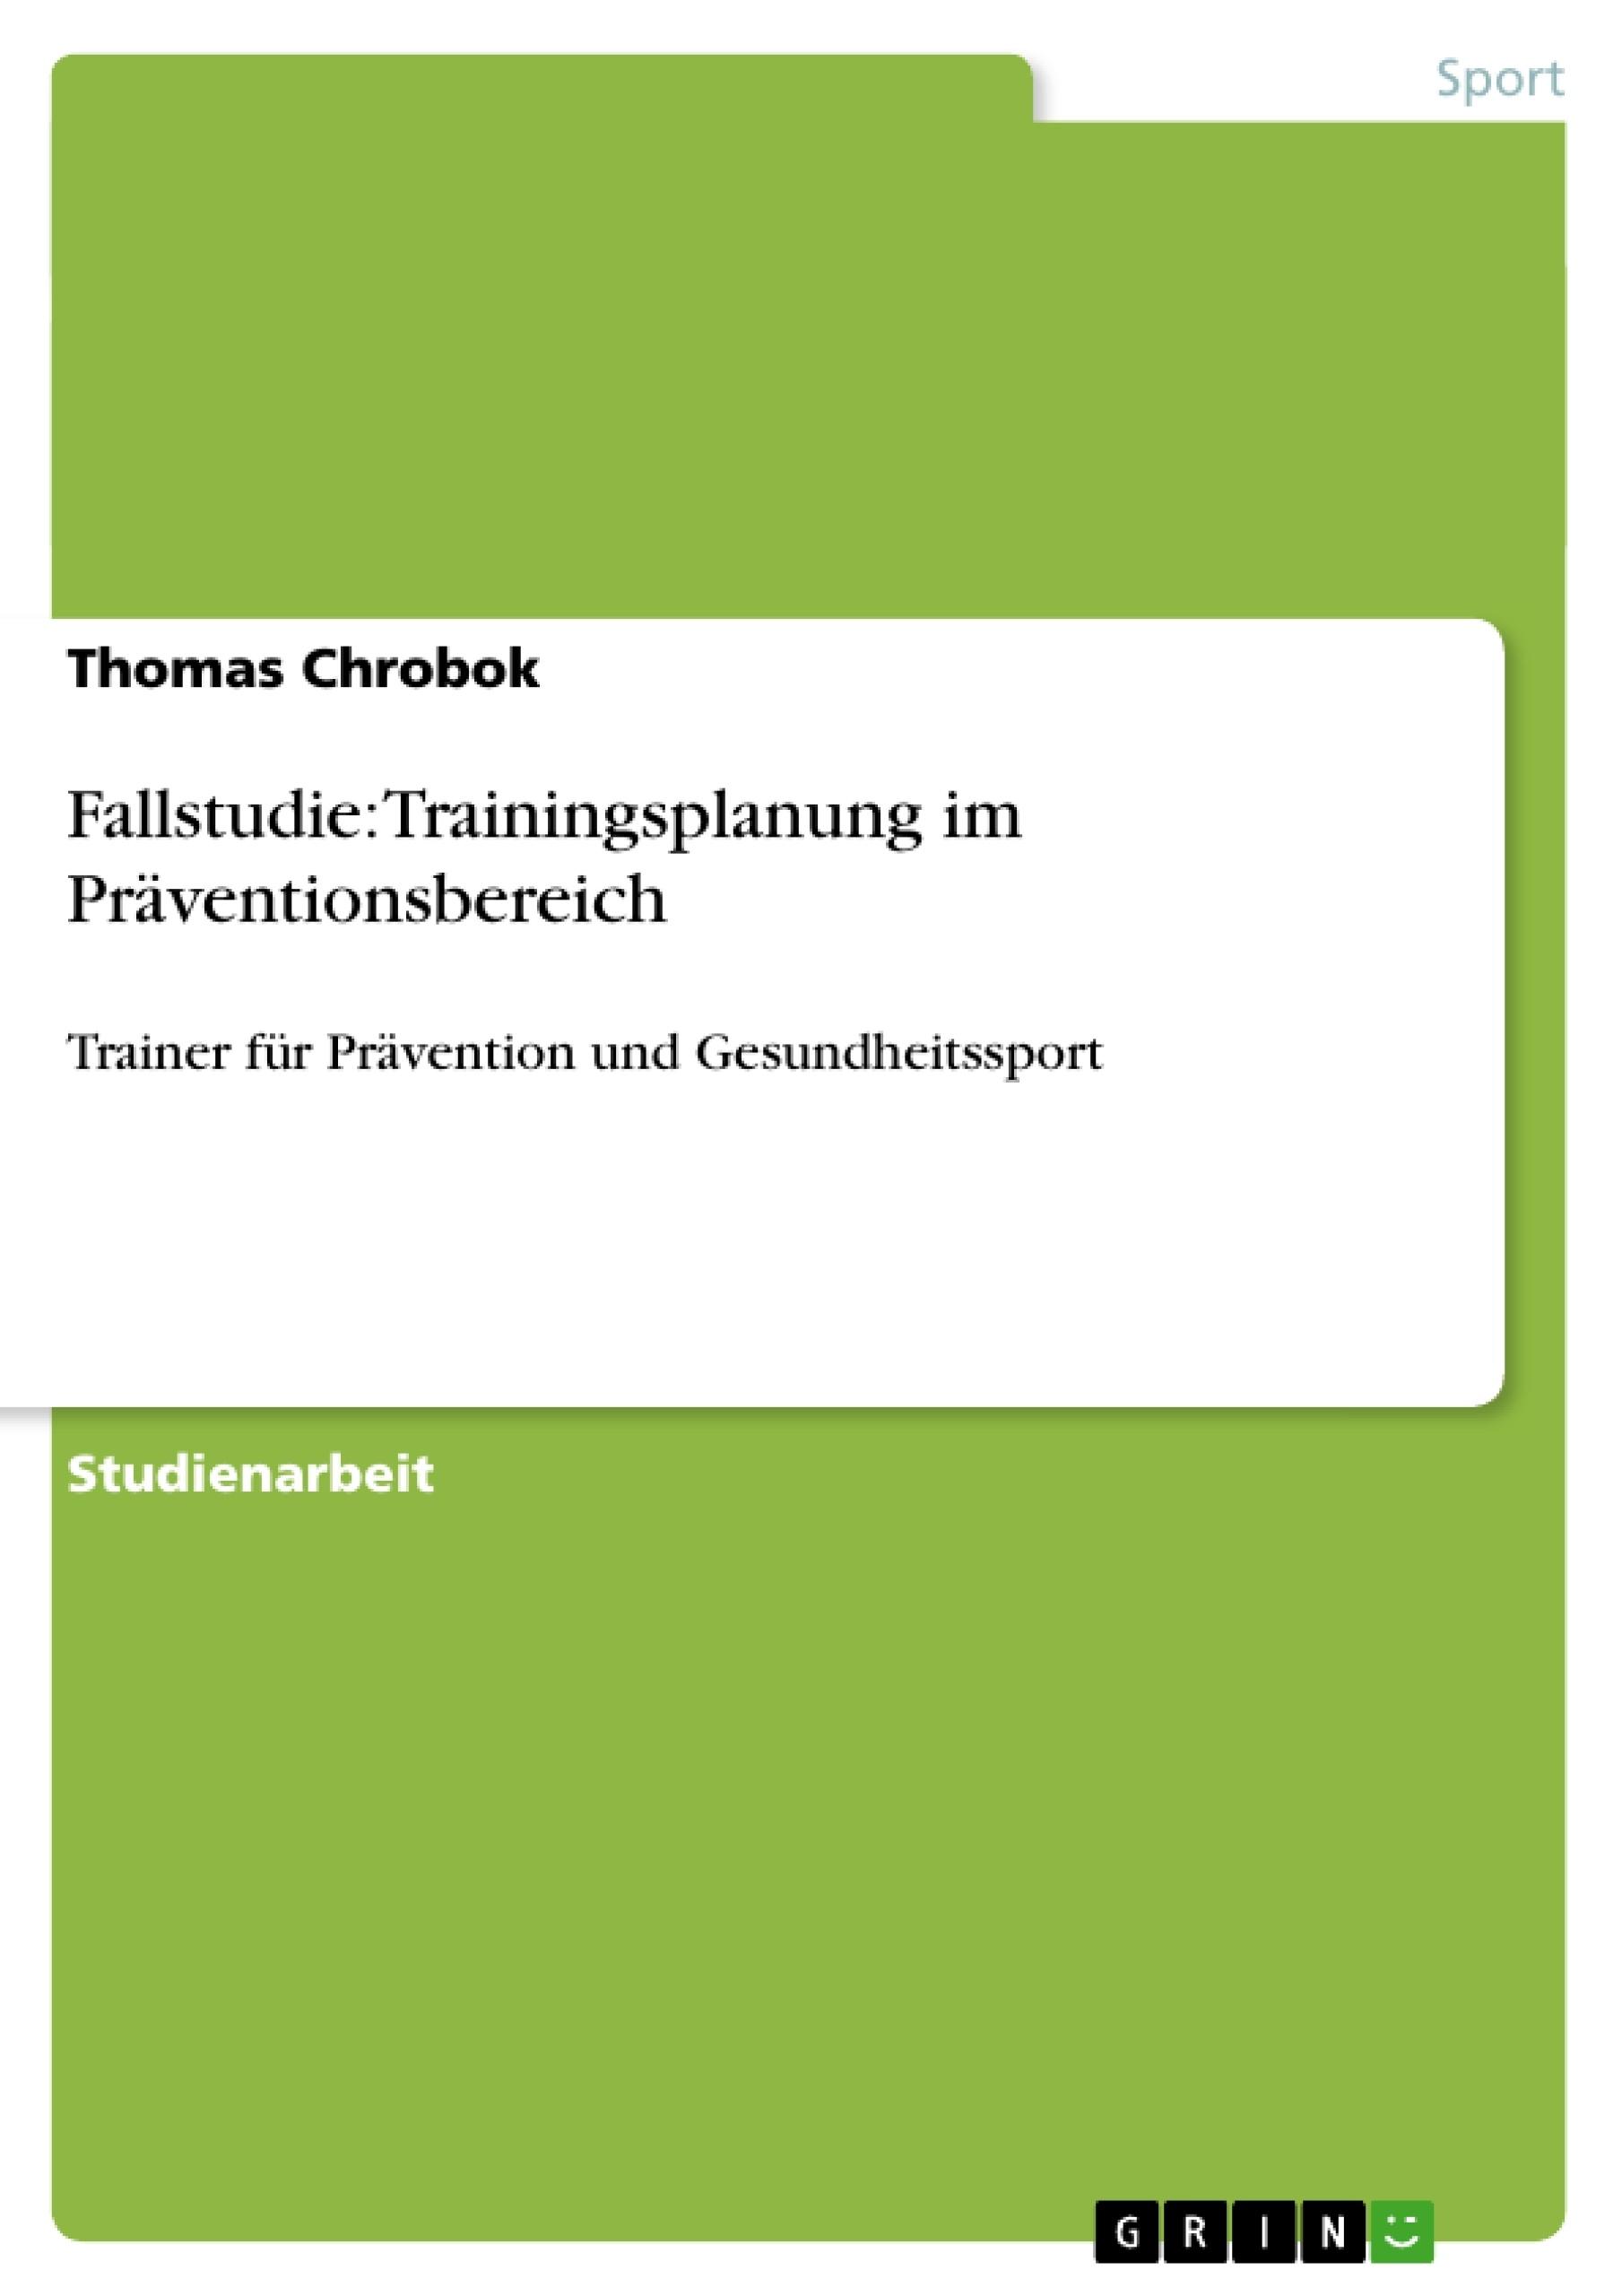 Titel: Fallstudie: Trainingsplanung im Präventionsbereich